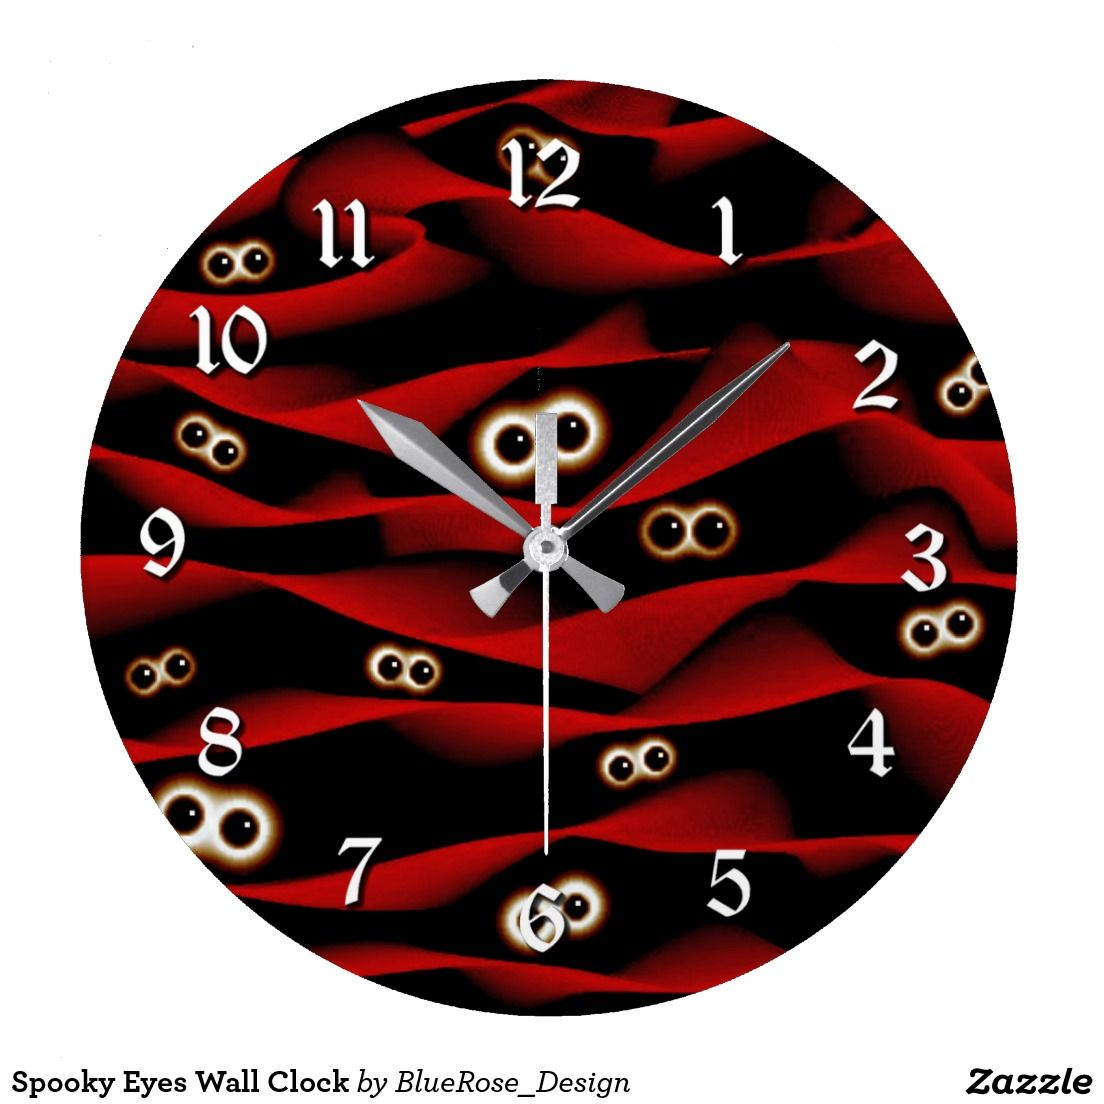 Spooky Eyes Wall Clock